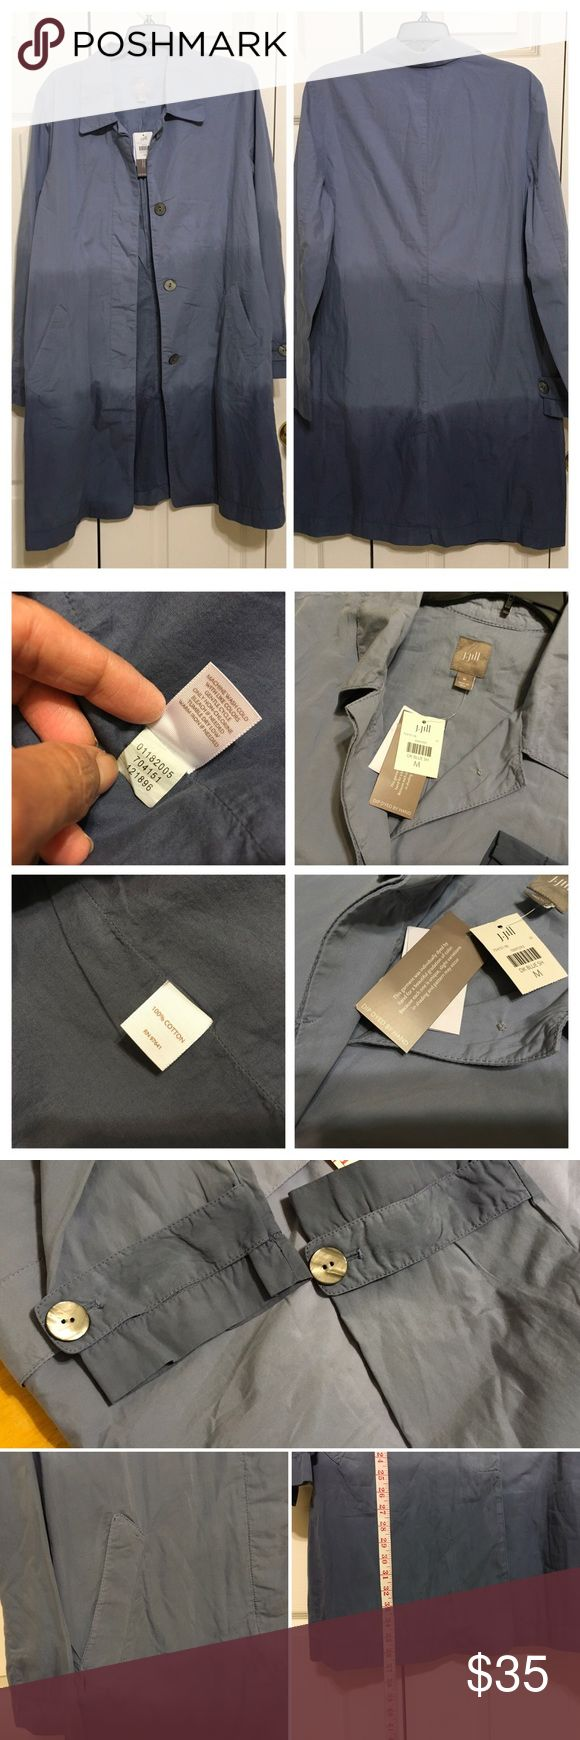 JJill M ombre Blue Cotton lined Trench jacket coat NWT J Jill women SZ M ombré Blue Cotton Blend lined Trench Coat topper jacket. Smoke pet free. J. Jill Jackets & Coats Trench Coats